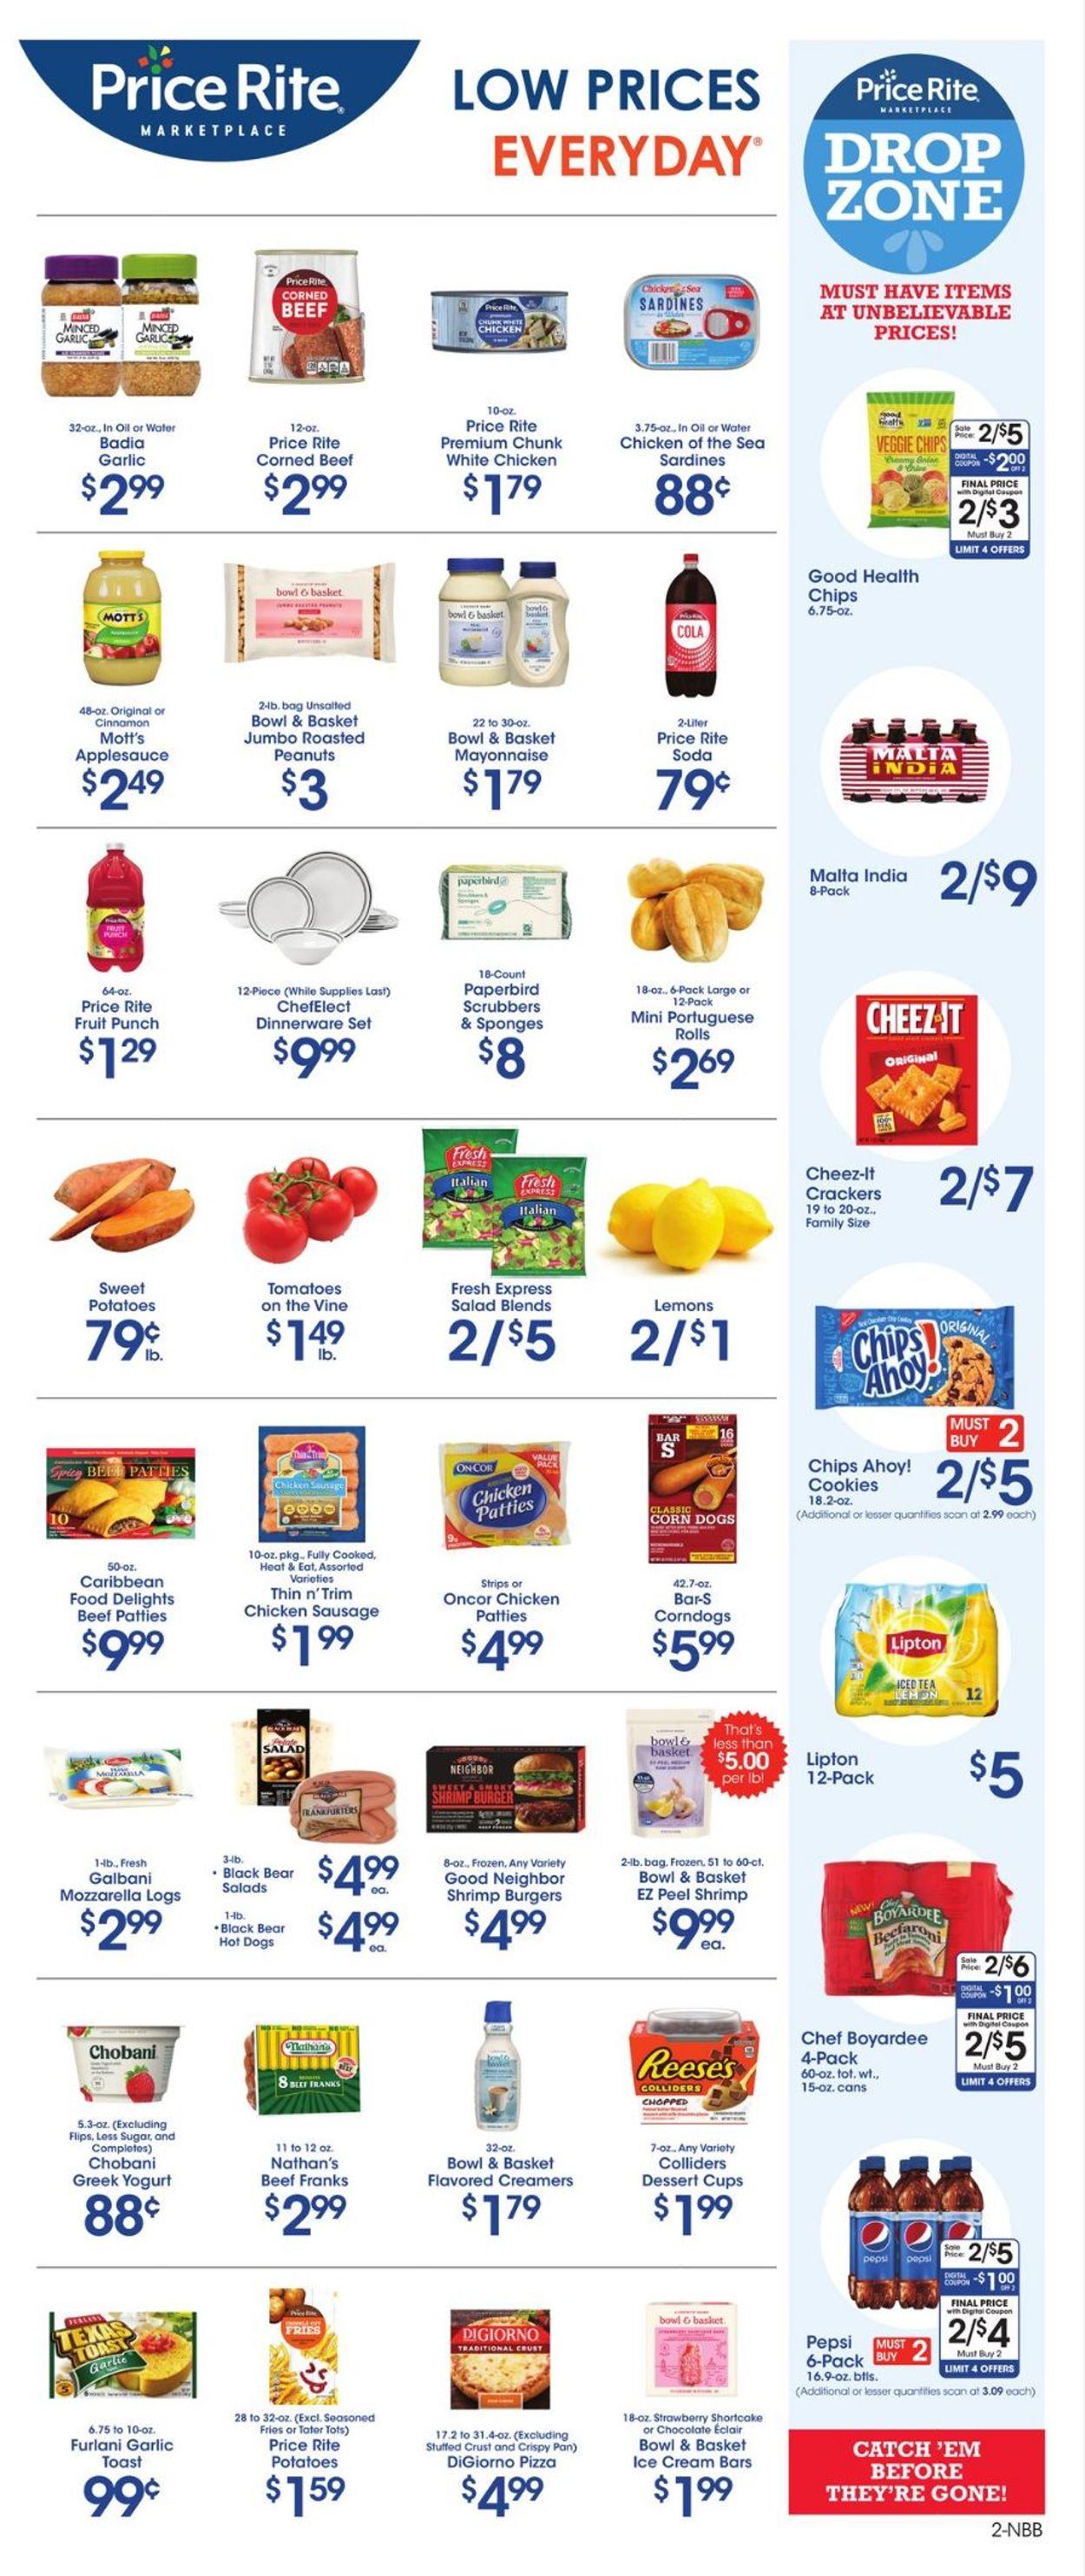 Price Rite Weekly Ad Circular - valid 07/30-08/05/2021 (Page 2)